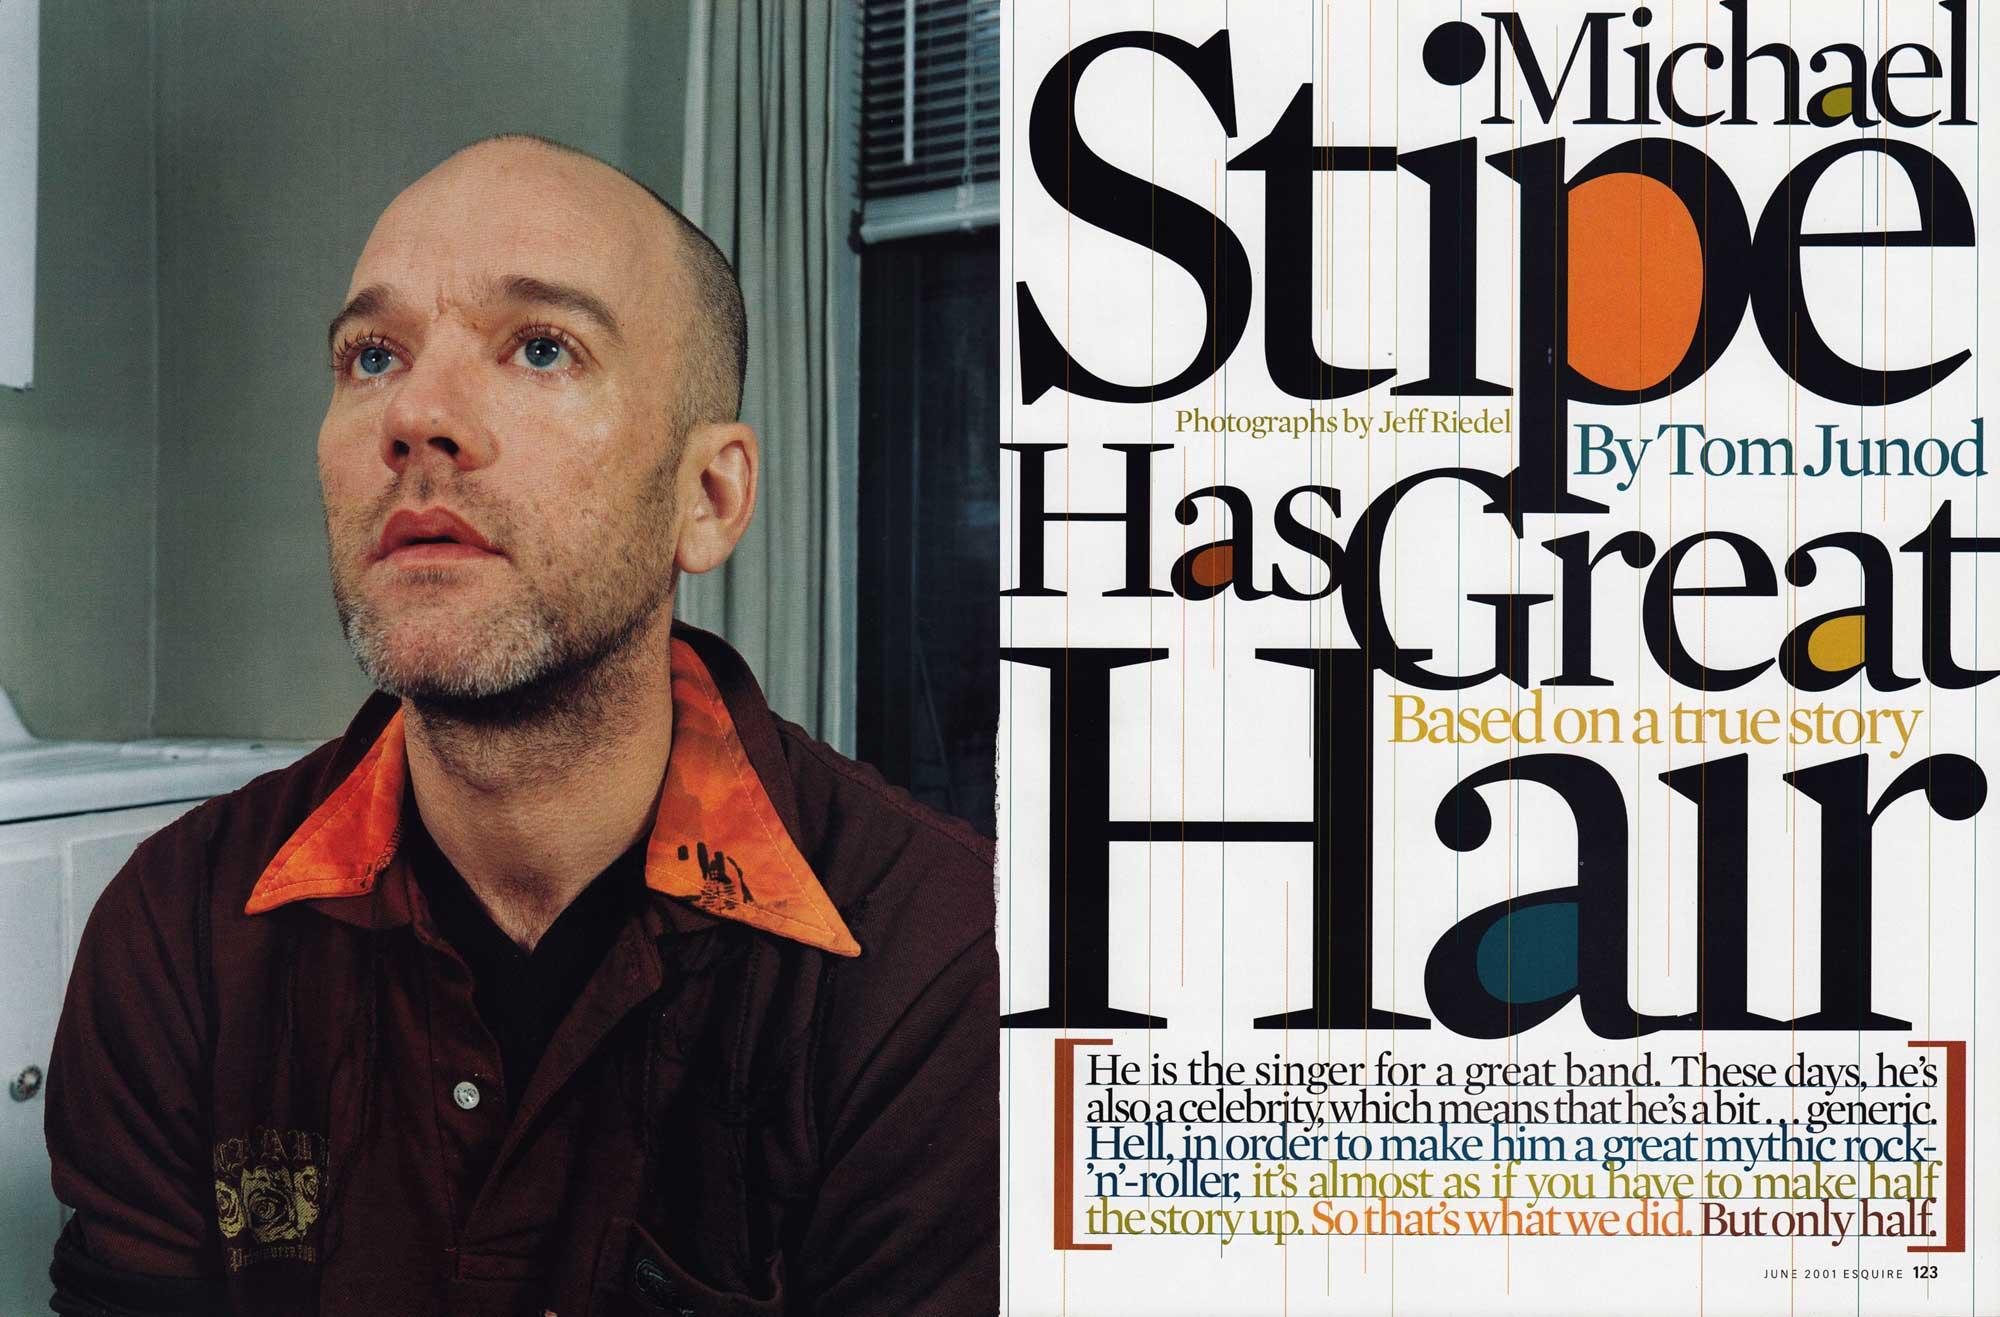 Michael Stipe's quote #3